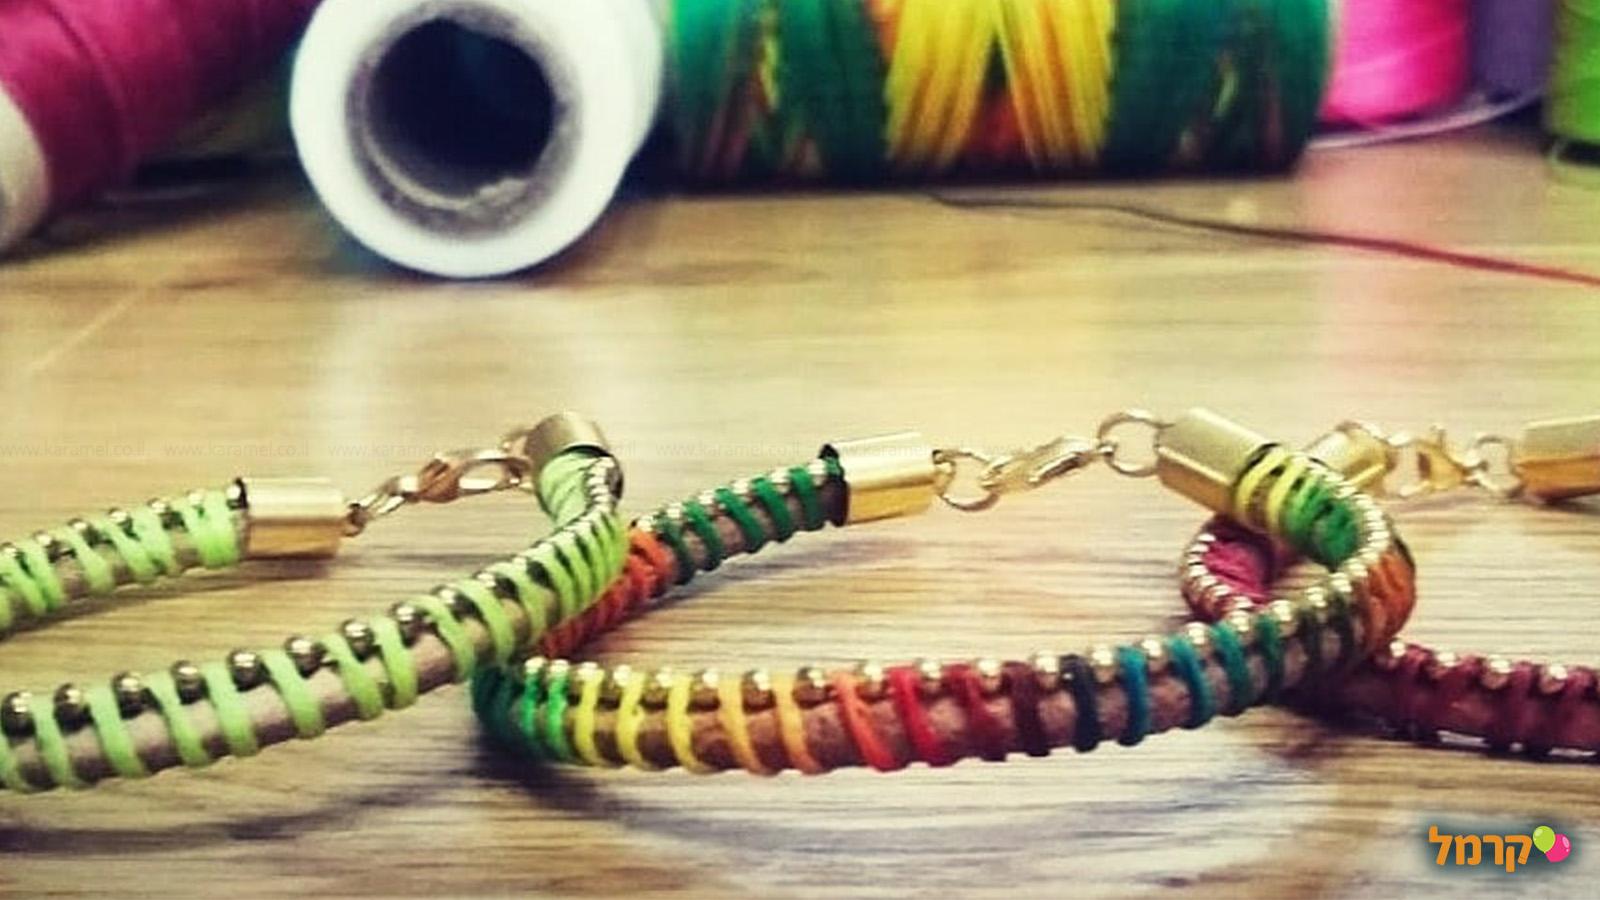 Rini's jewelry - עיצובים מהפנטים - 073-7758044